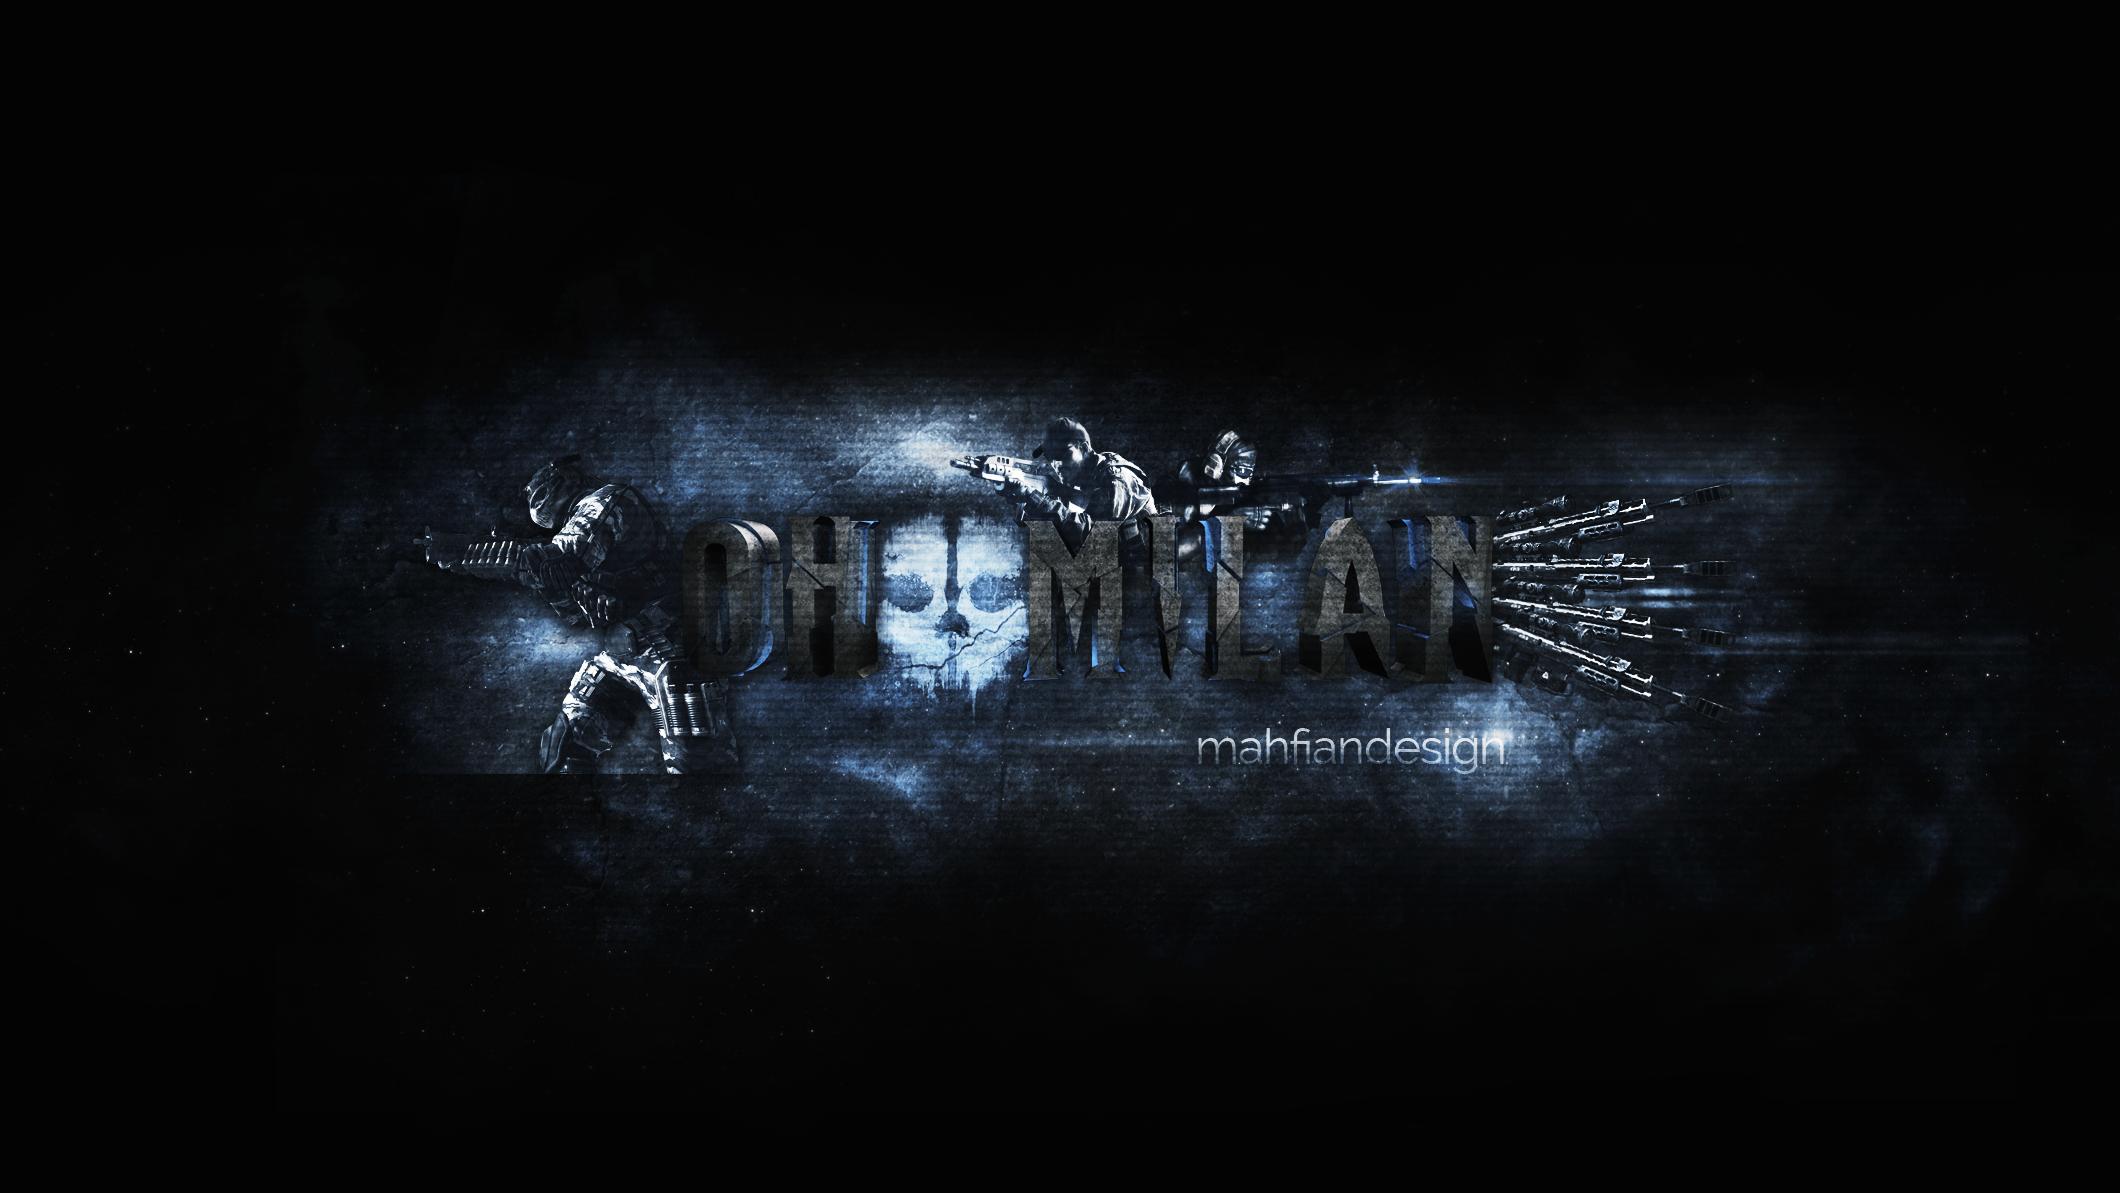 mahfian | Explore mahfian on DeviantArt